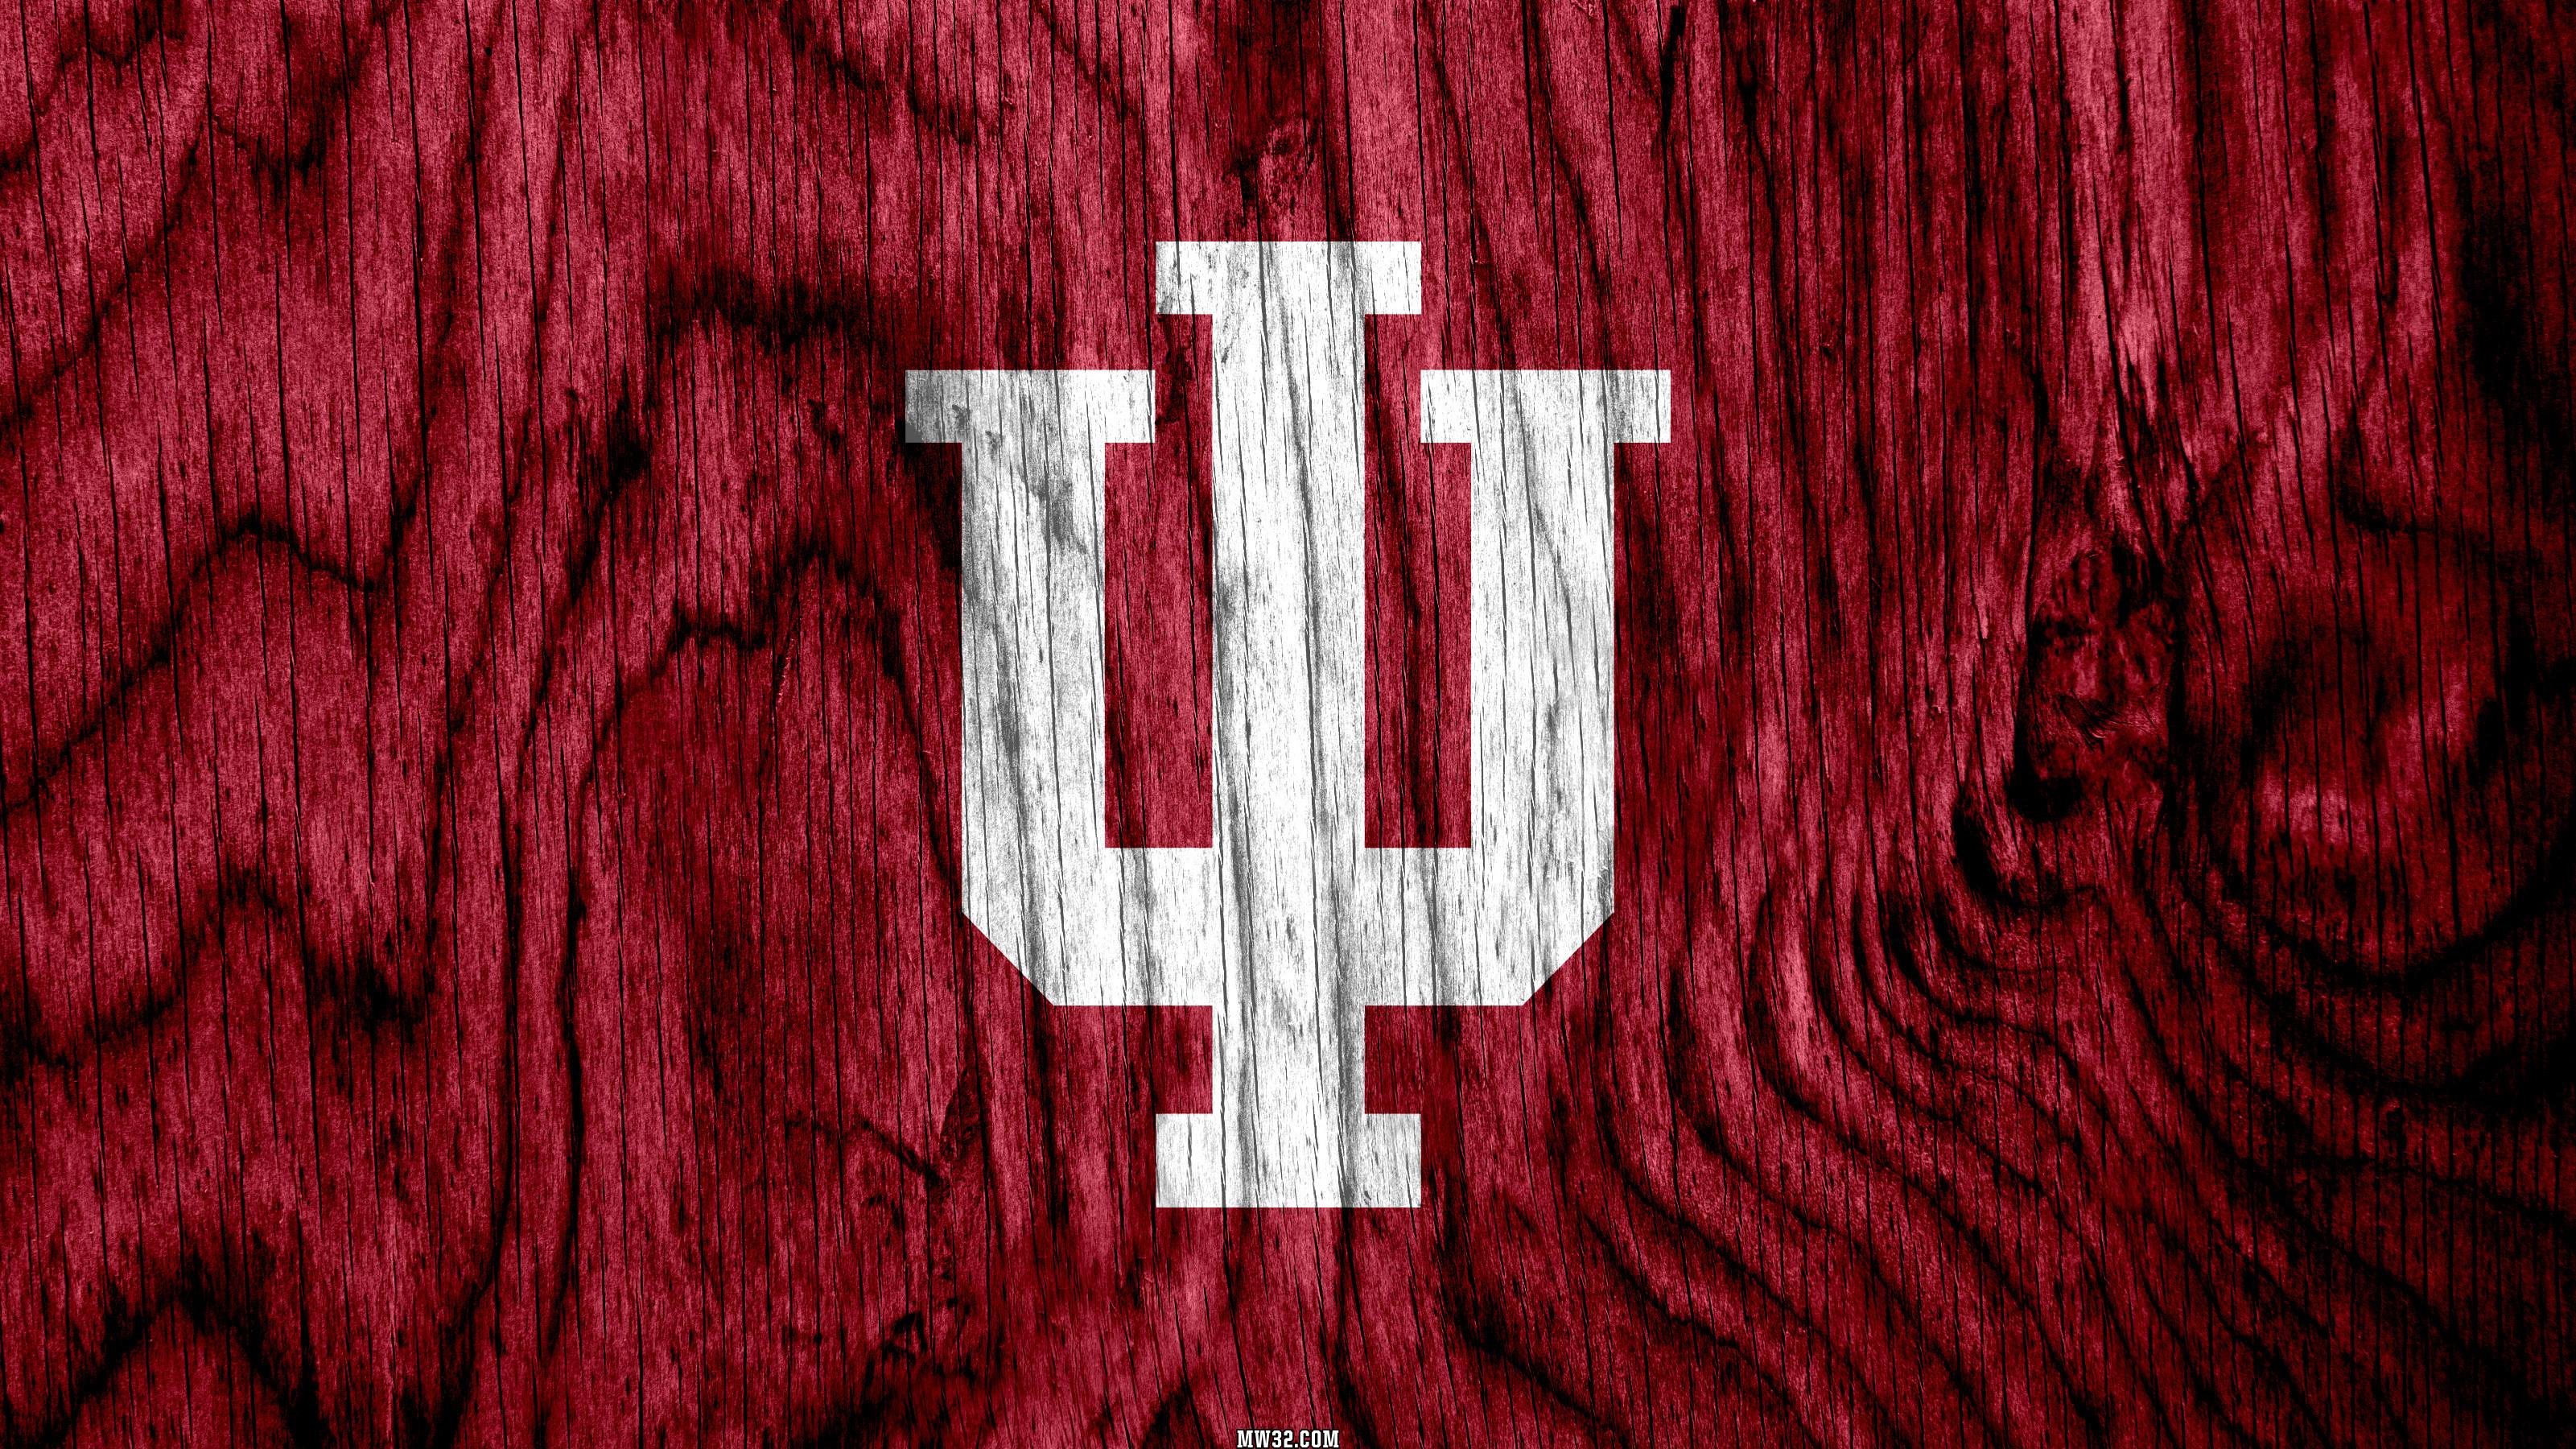 Indiana University Wallpaper For Desktop 53 Images